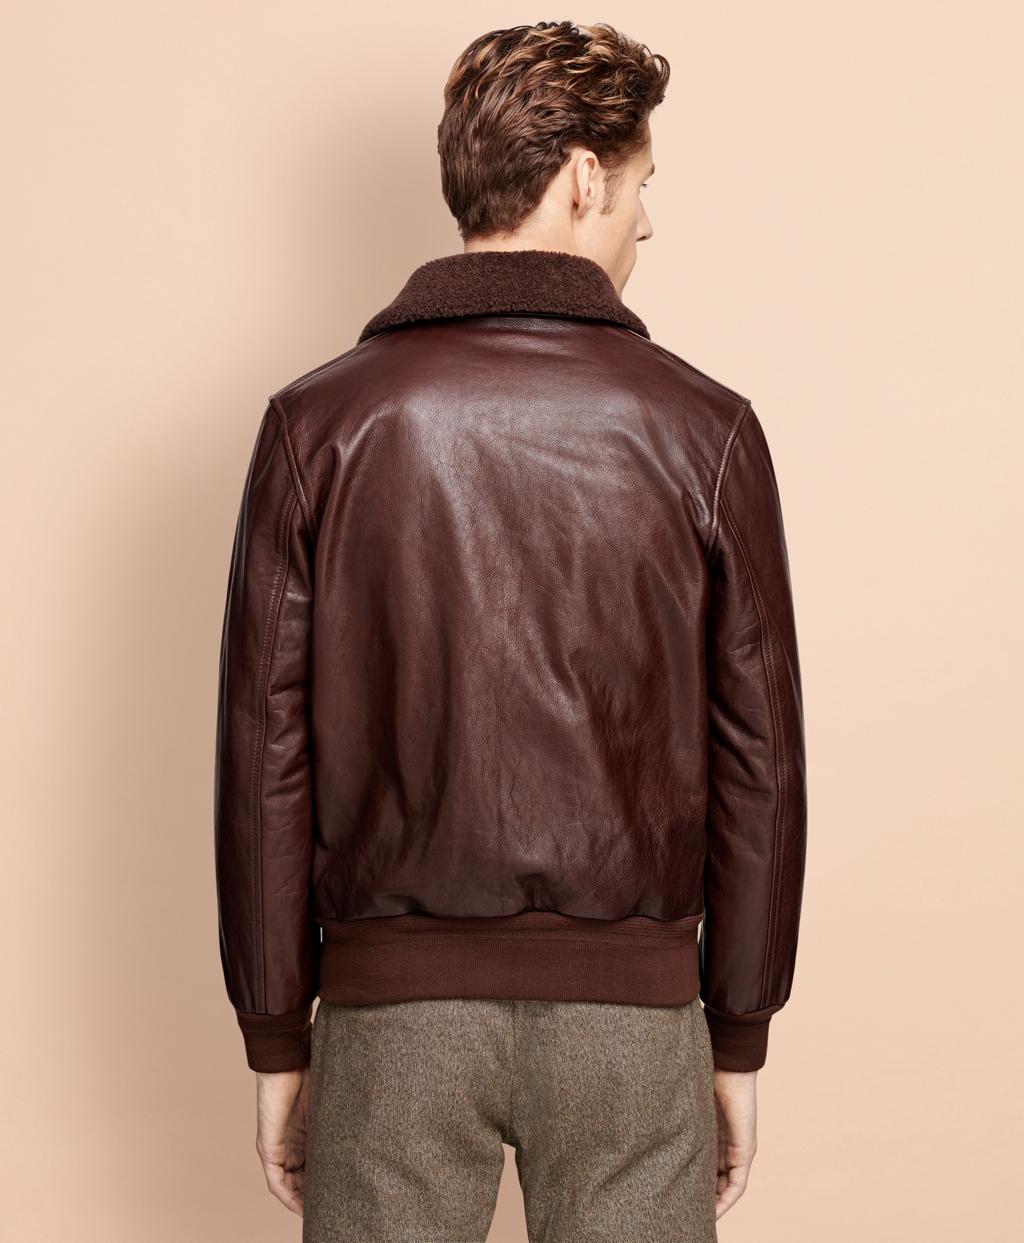 eb55b1e5c84 Men s Brown Leather Bomber Jacket